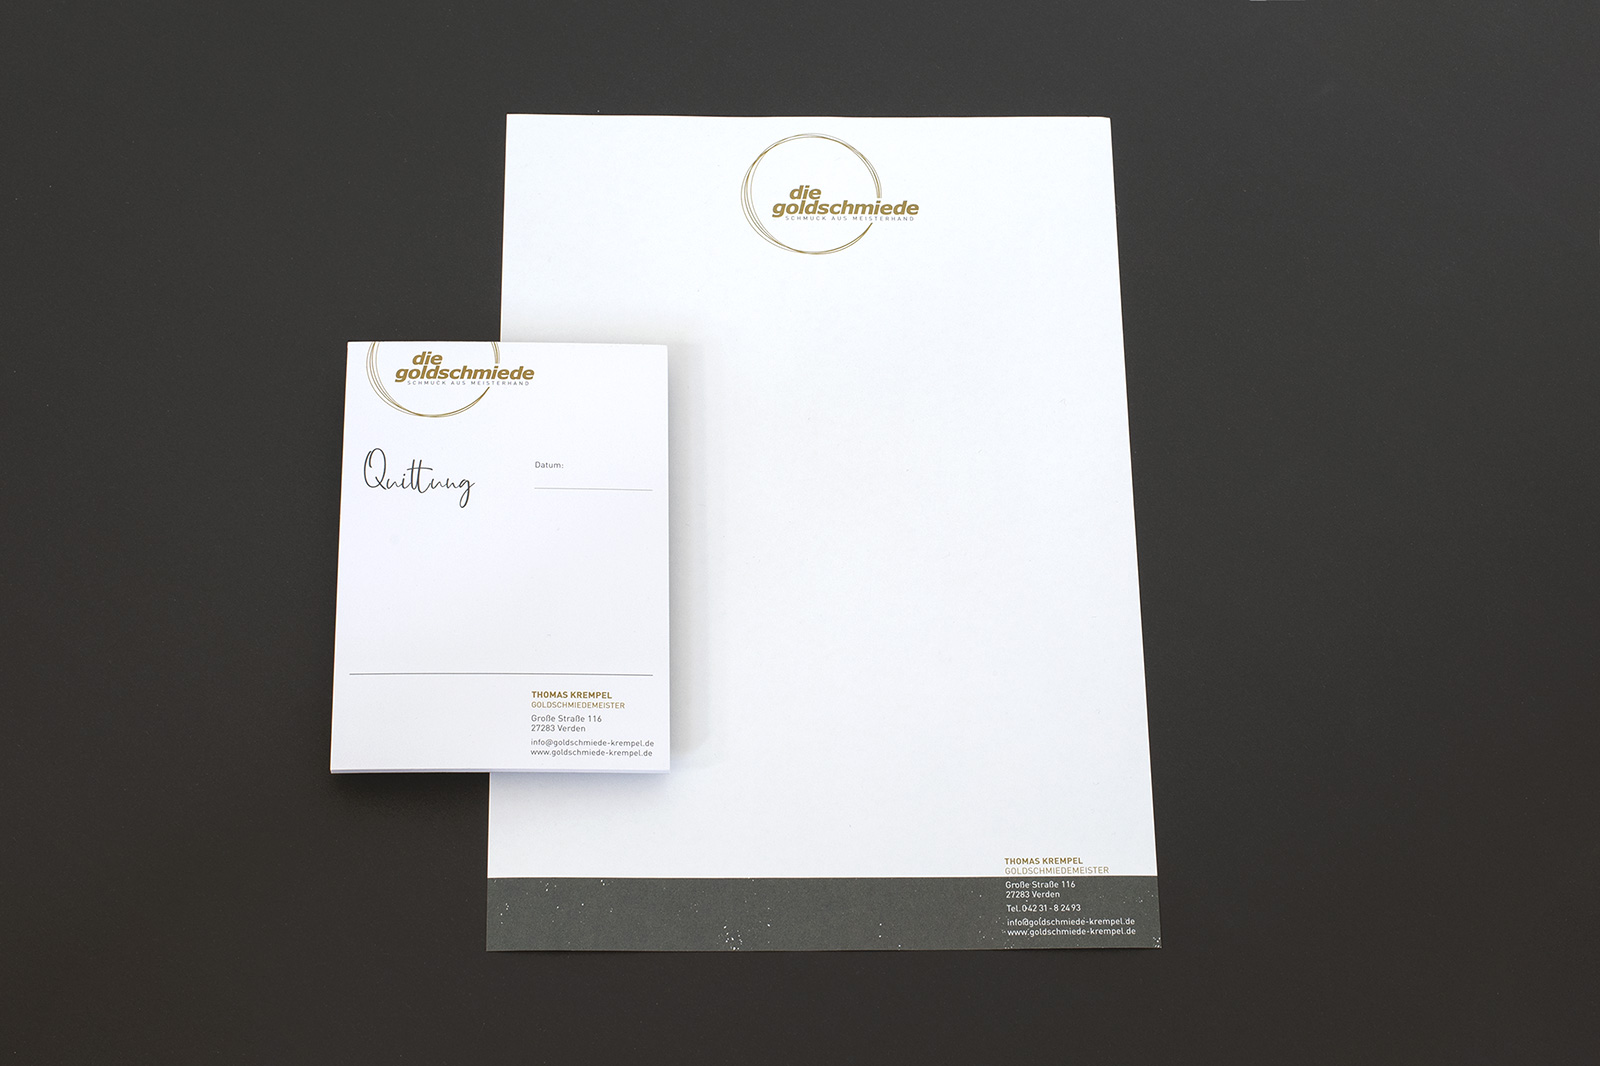 briefpapier-design-verden